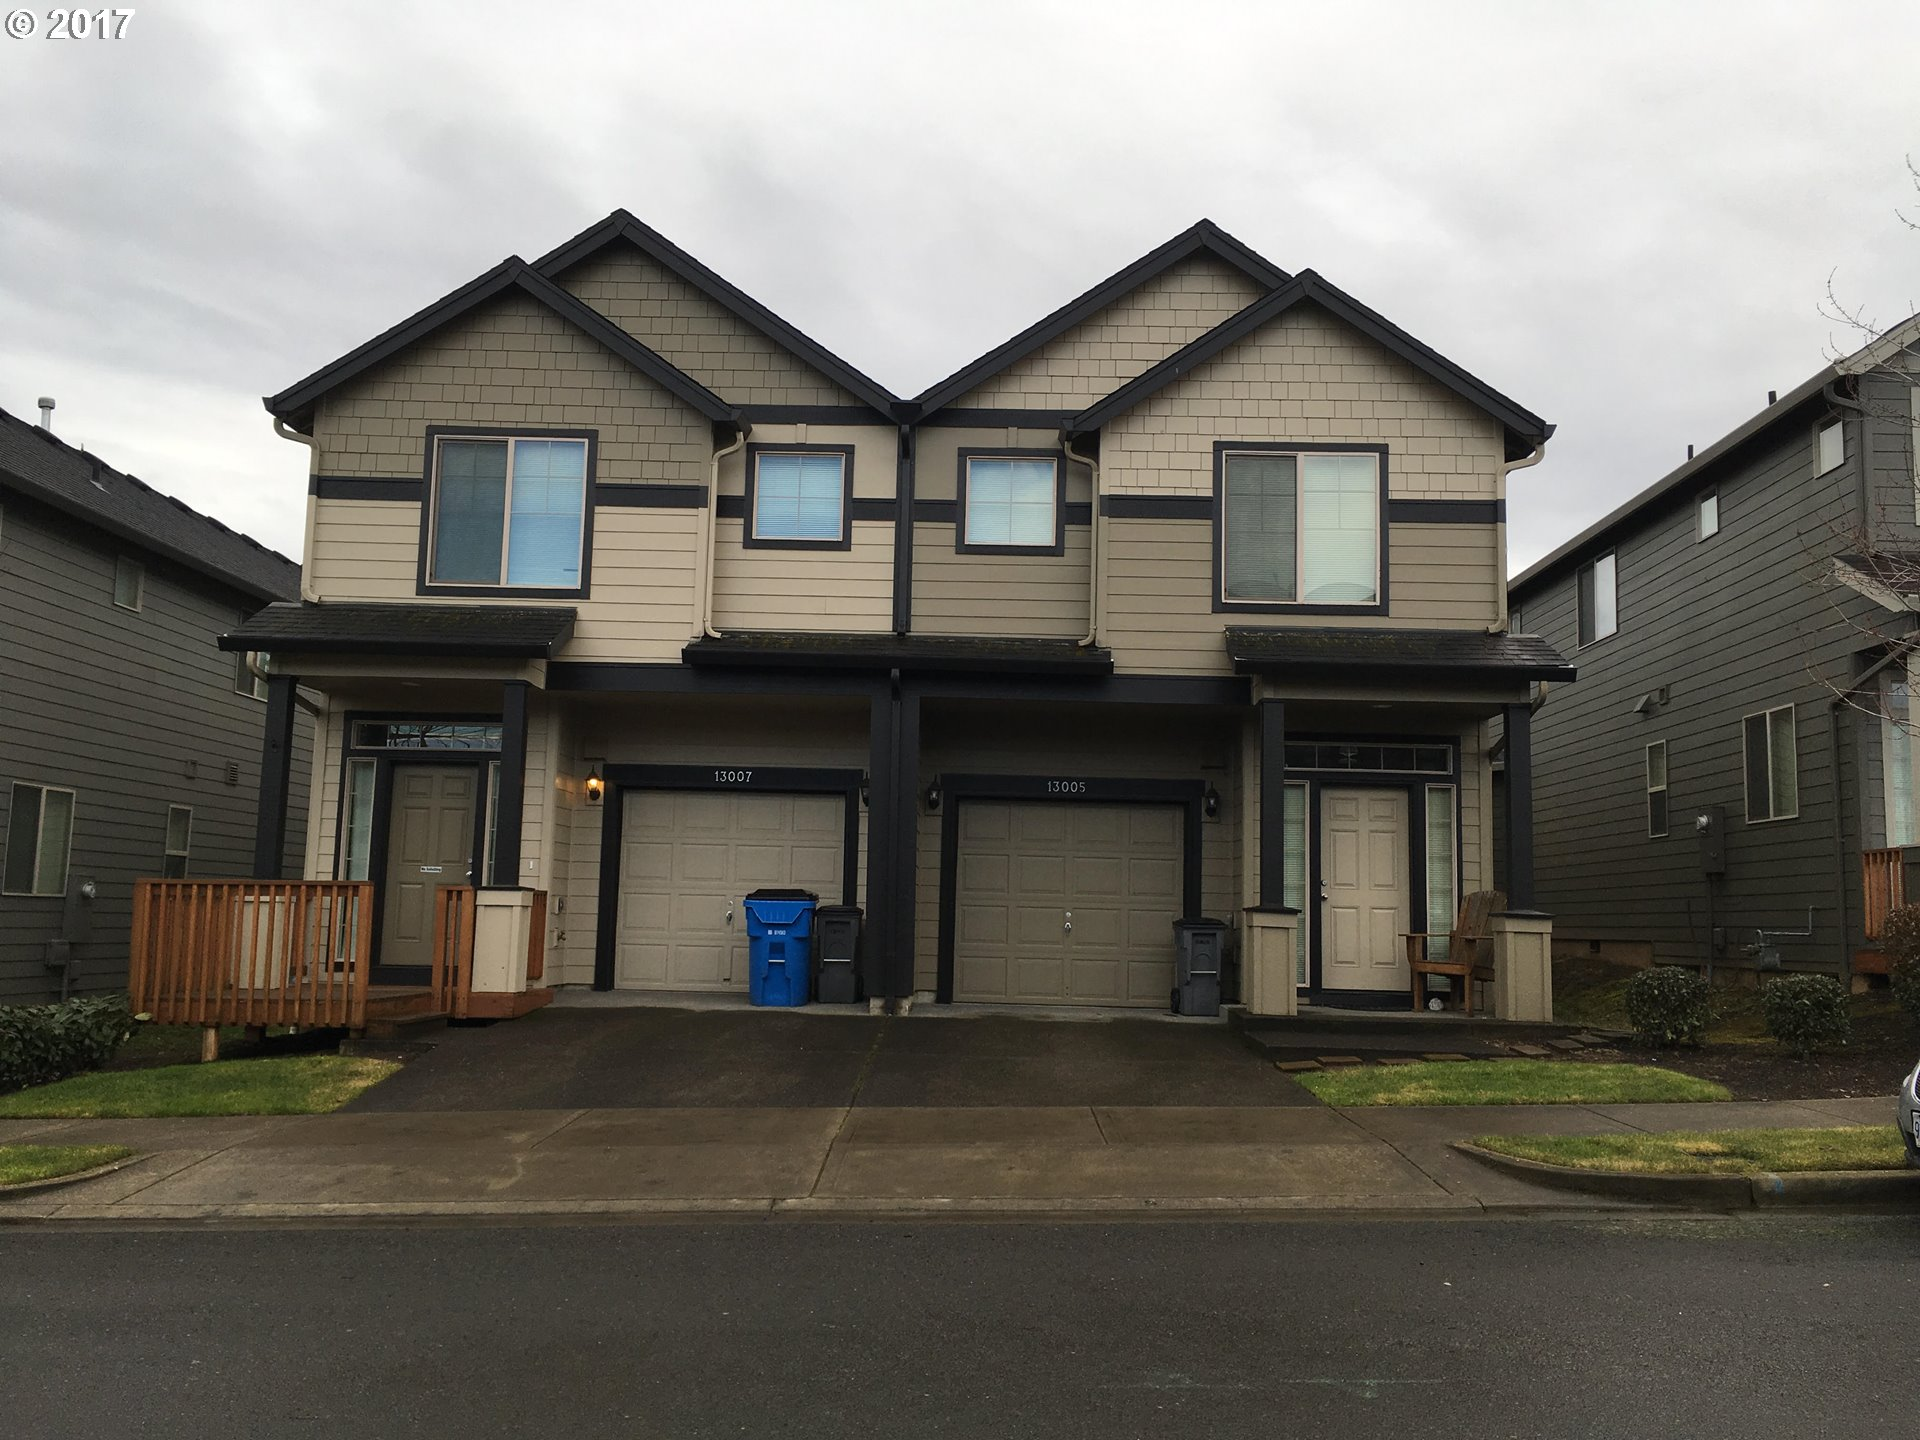 13001 NE 25TH ST, Vancouver, WA 98684